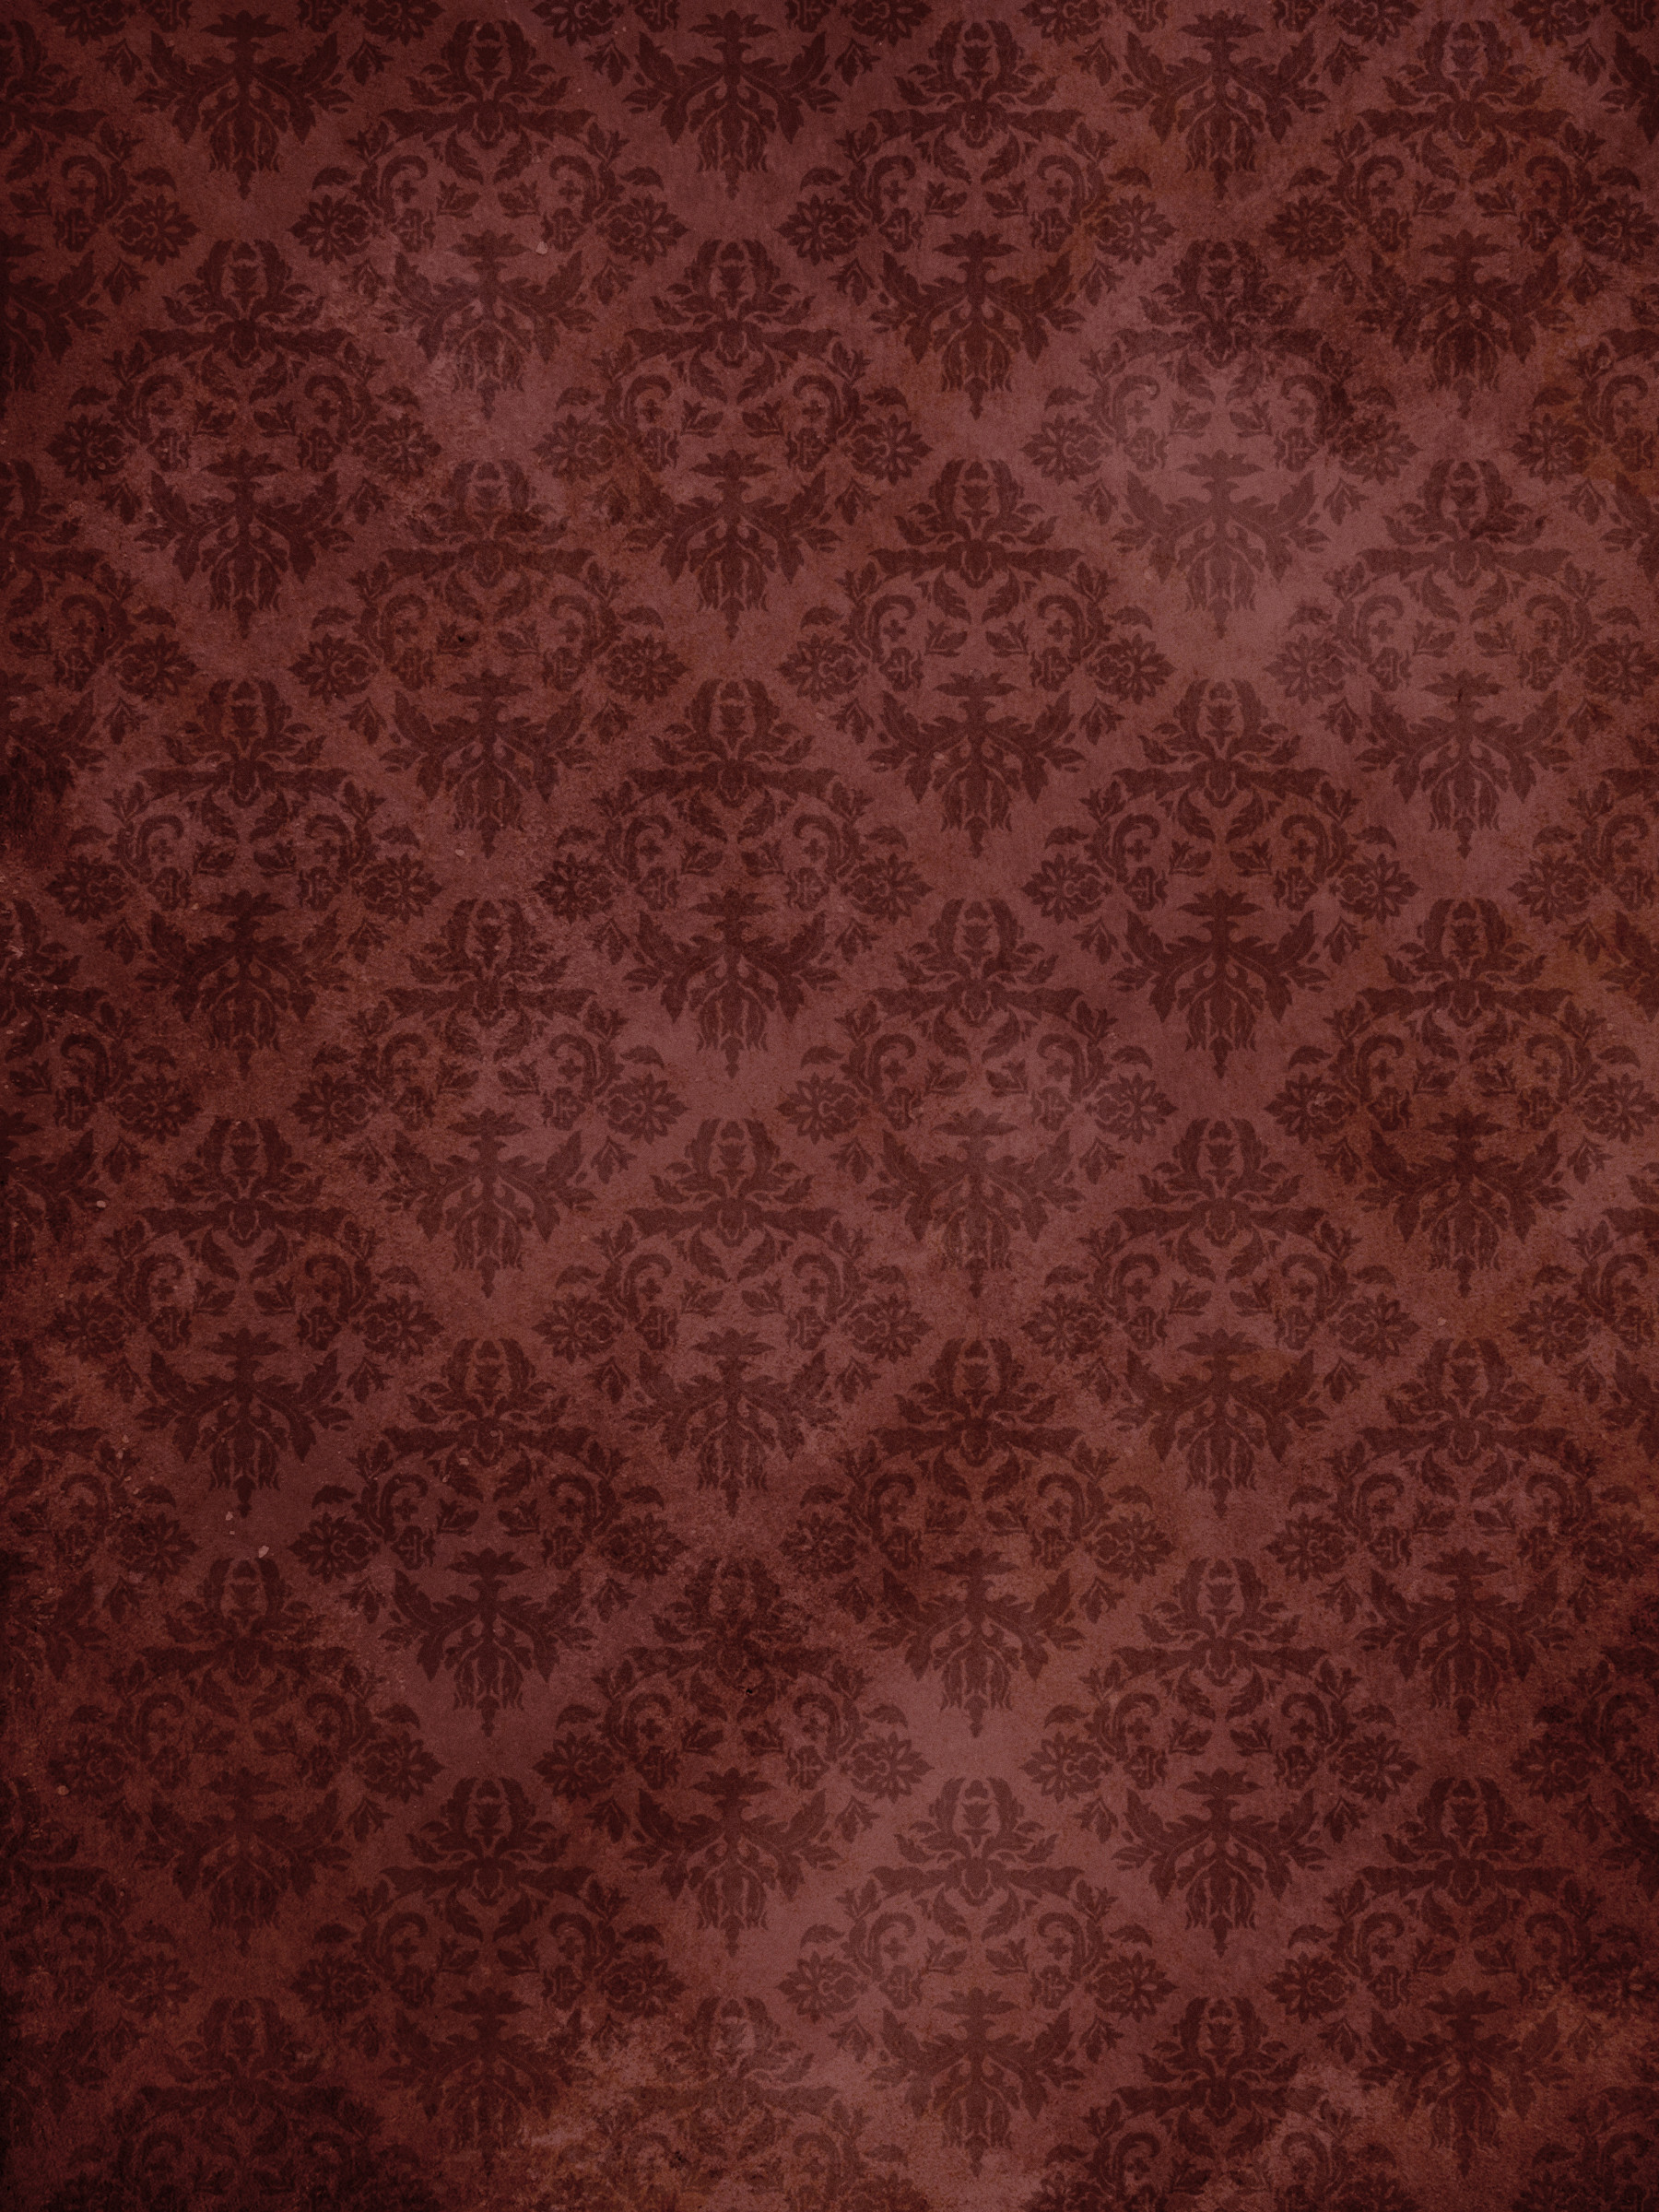 Vintage Pattern Wallpaper Texture